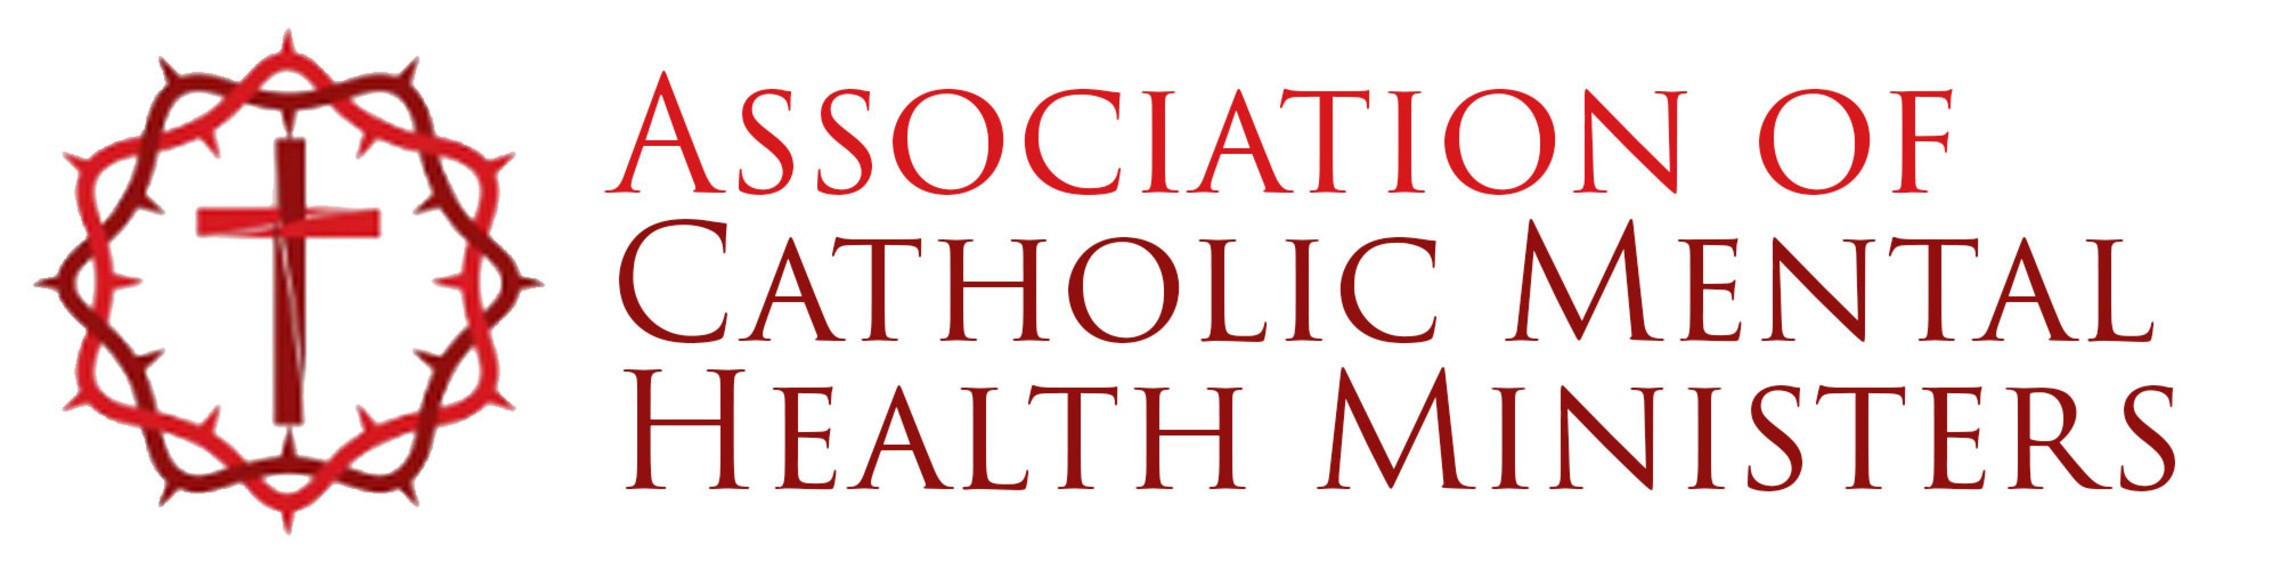 Association of Catholic Mental Health Ministers